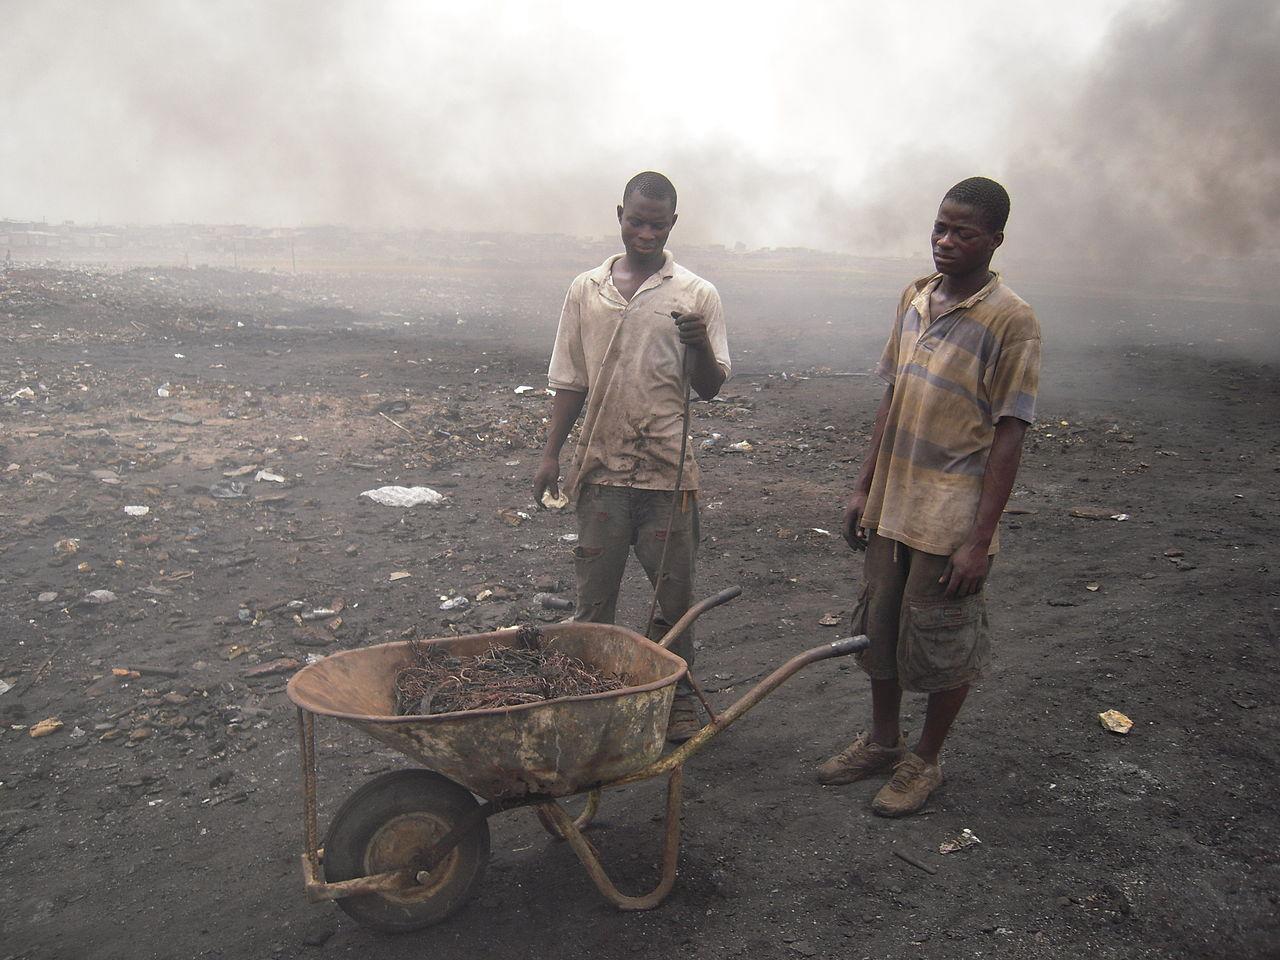 Agbogbloshie pollution